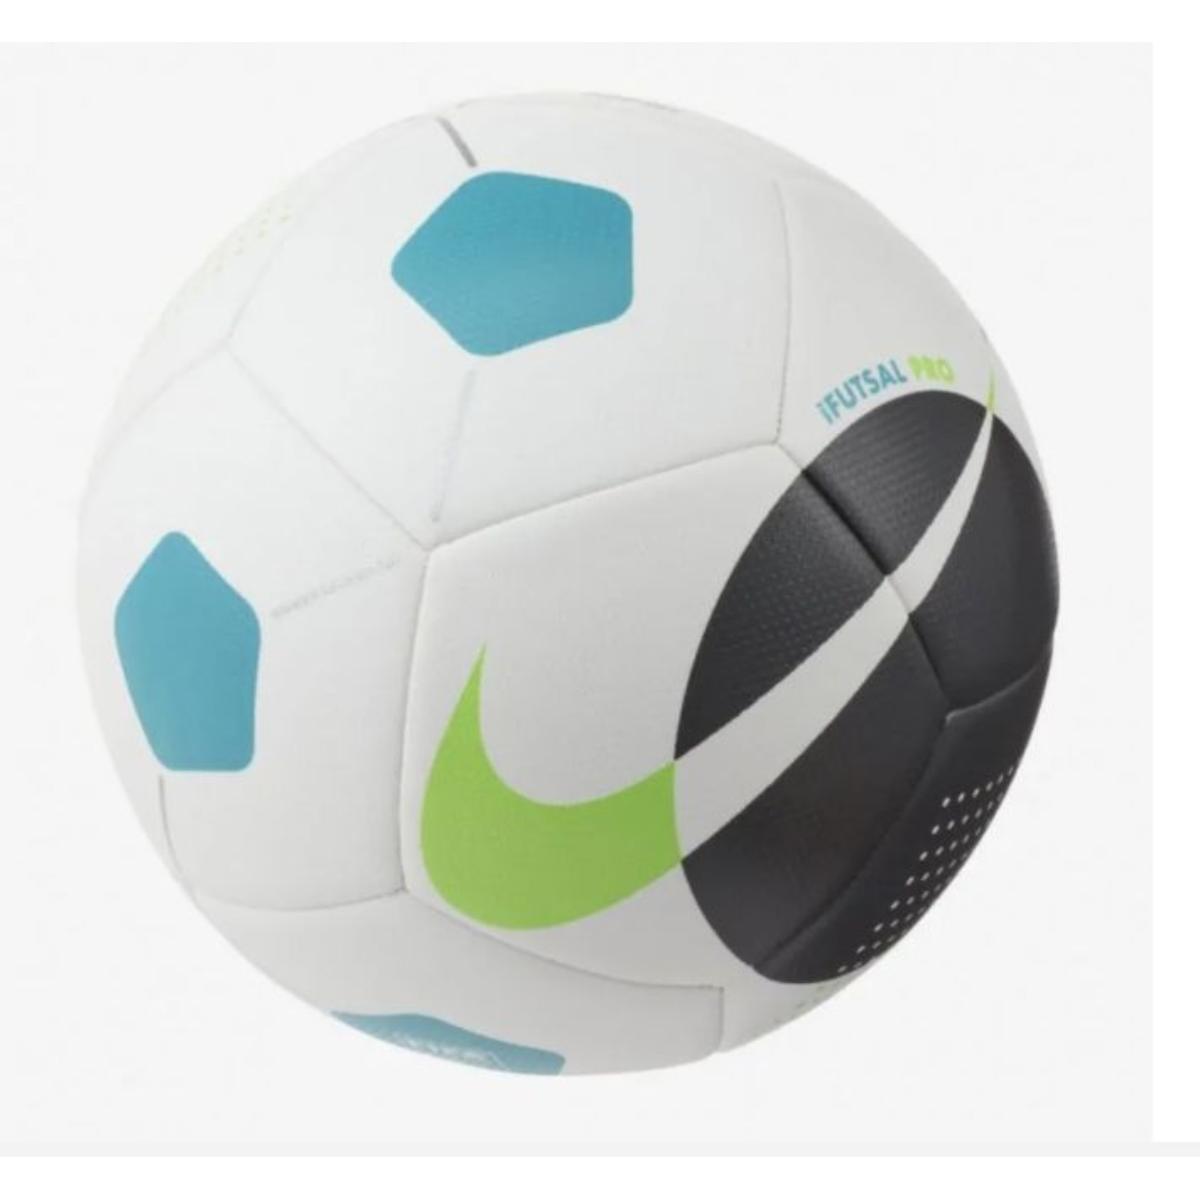 Bola Unisex Nike Sc3974-103 Maestro Branco/preto/azul